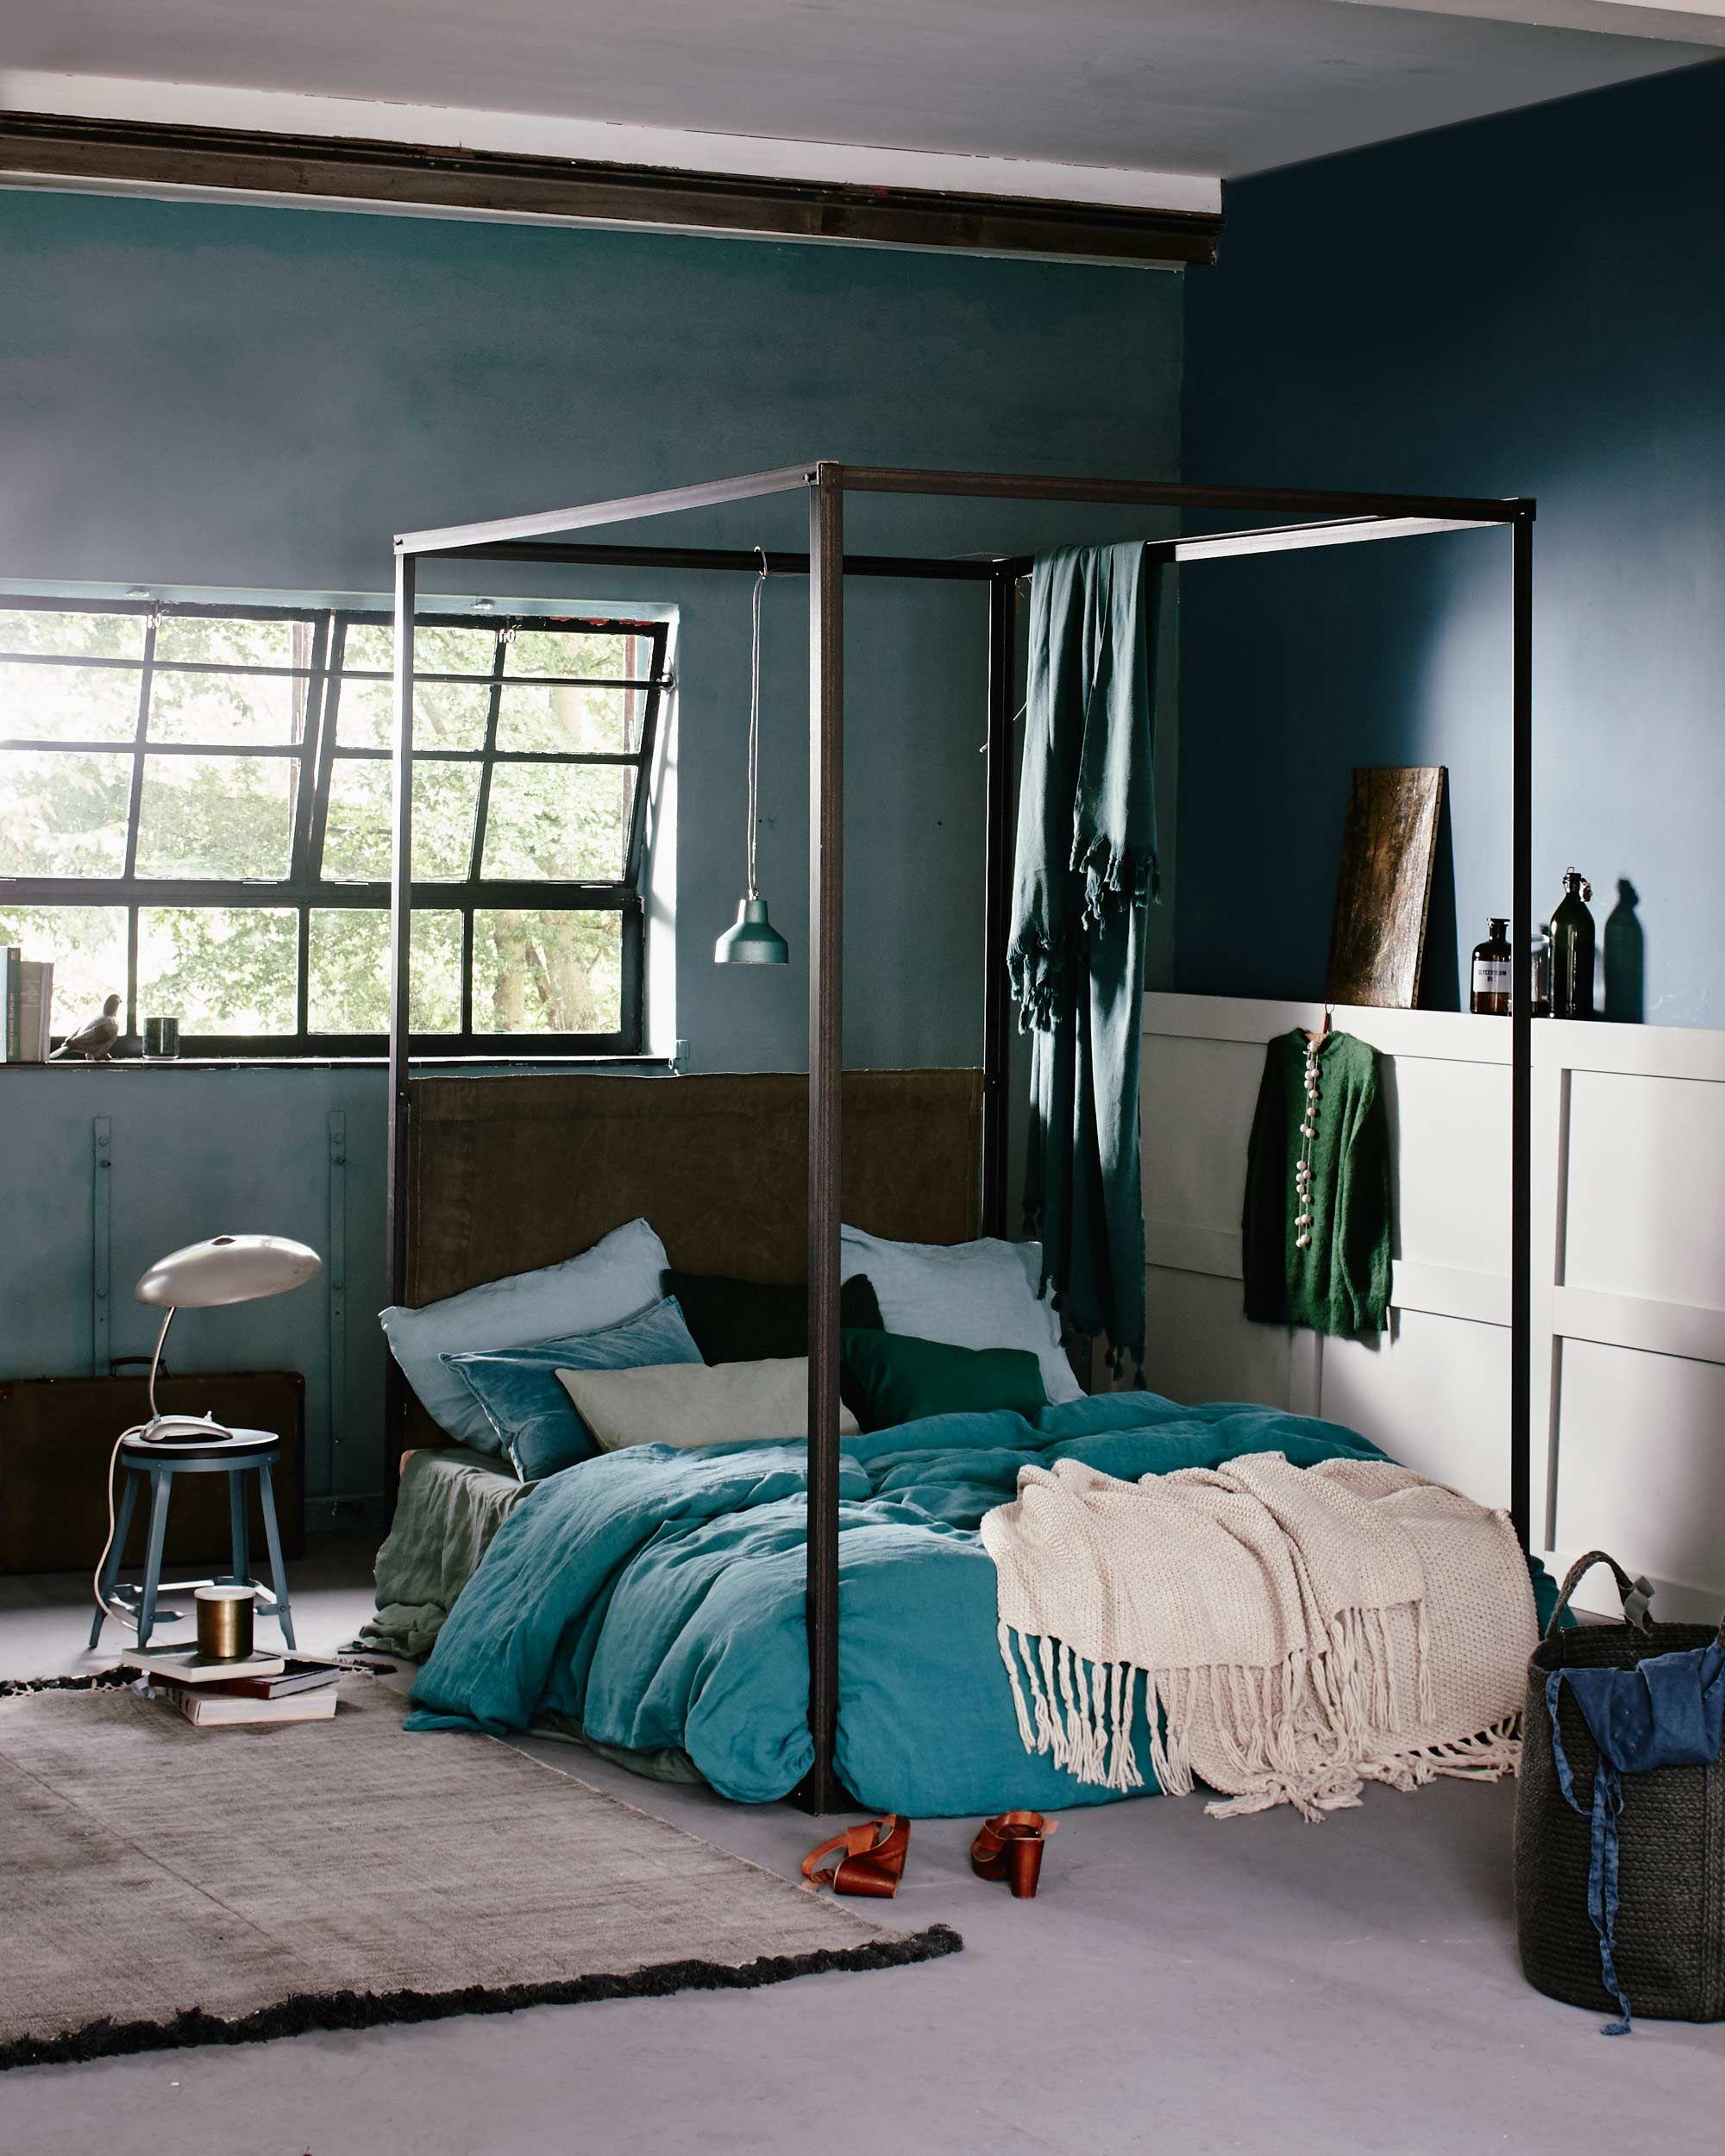 chambre verte lit | bedrooms | Pinterest | Chambres vertes, Vert et ...